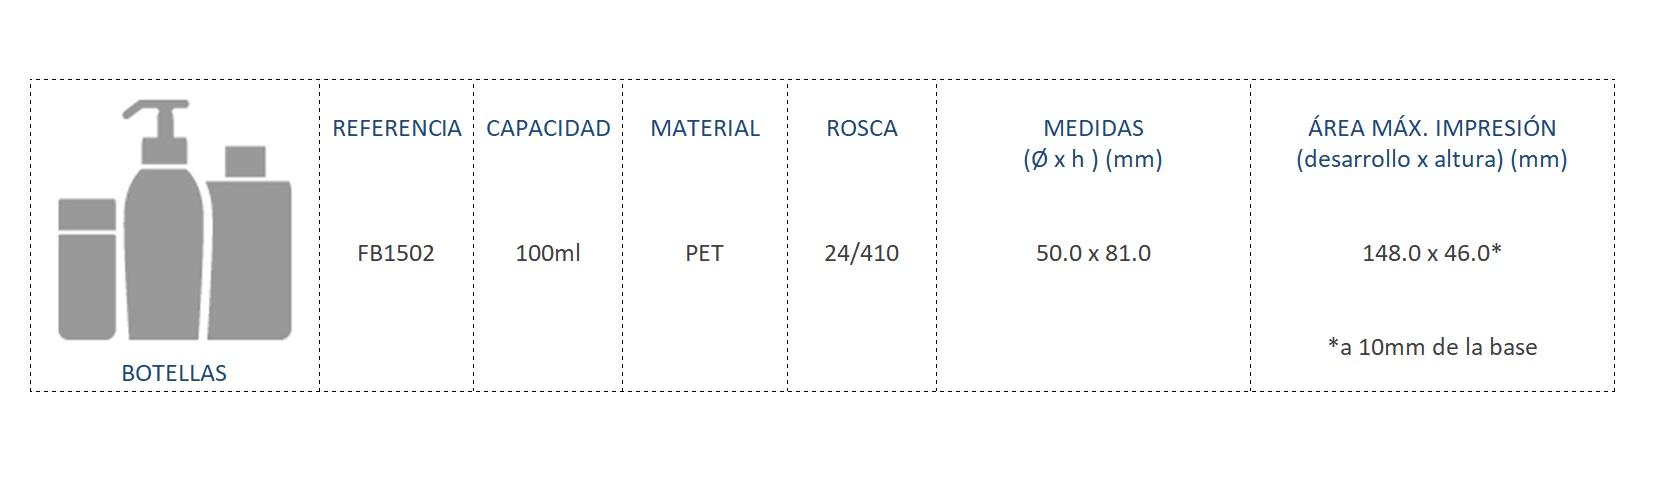 Cuadro de materiales FB1502